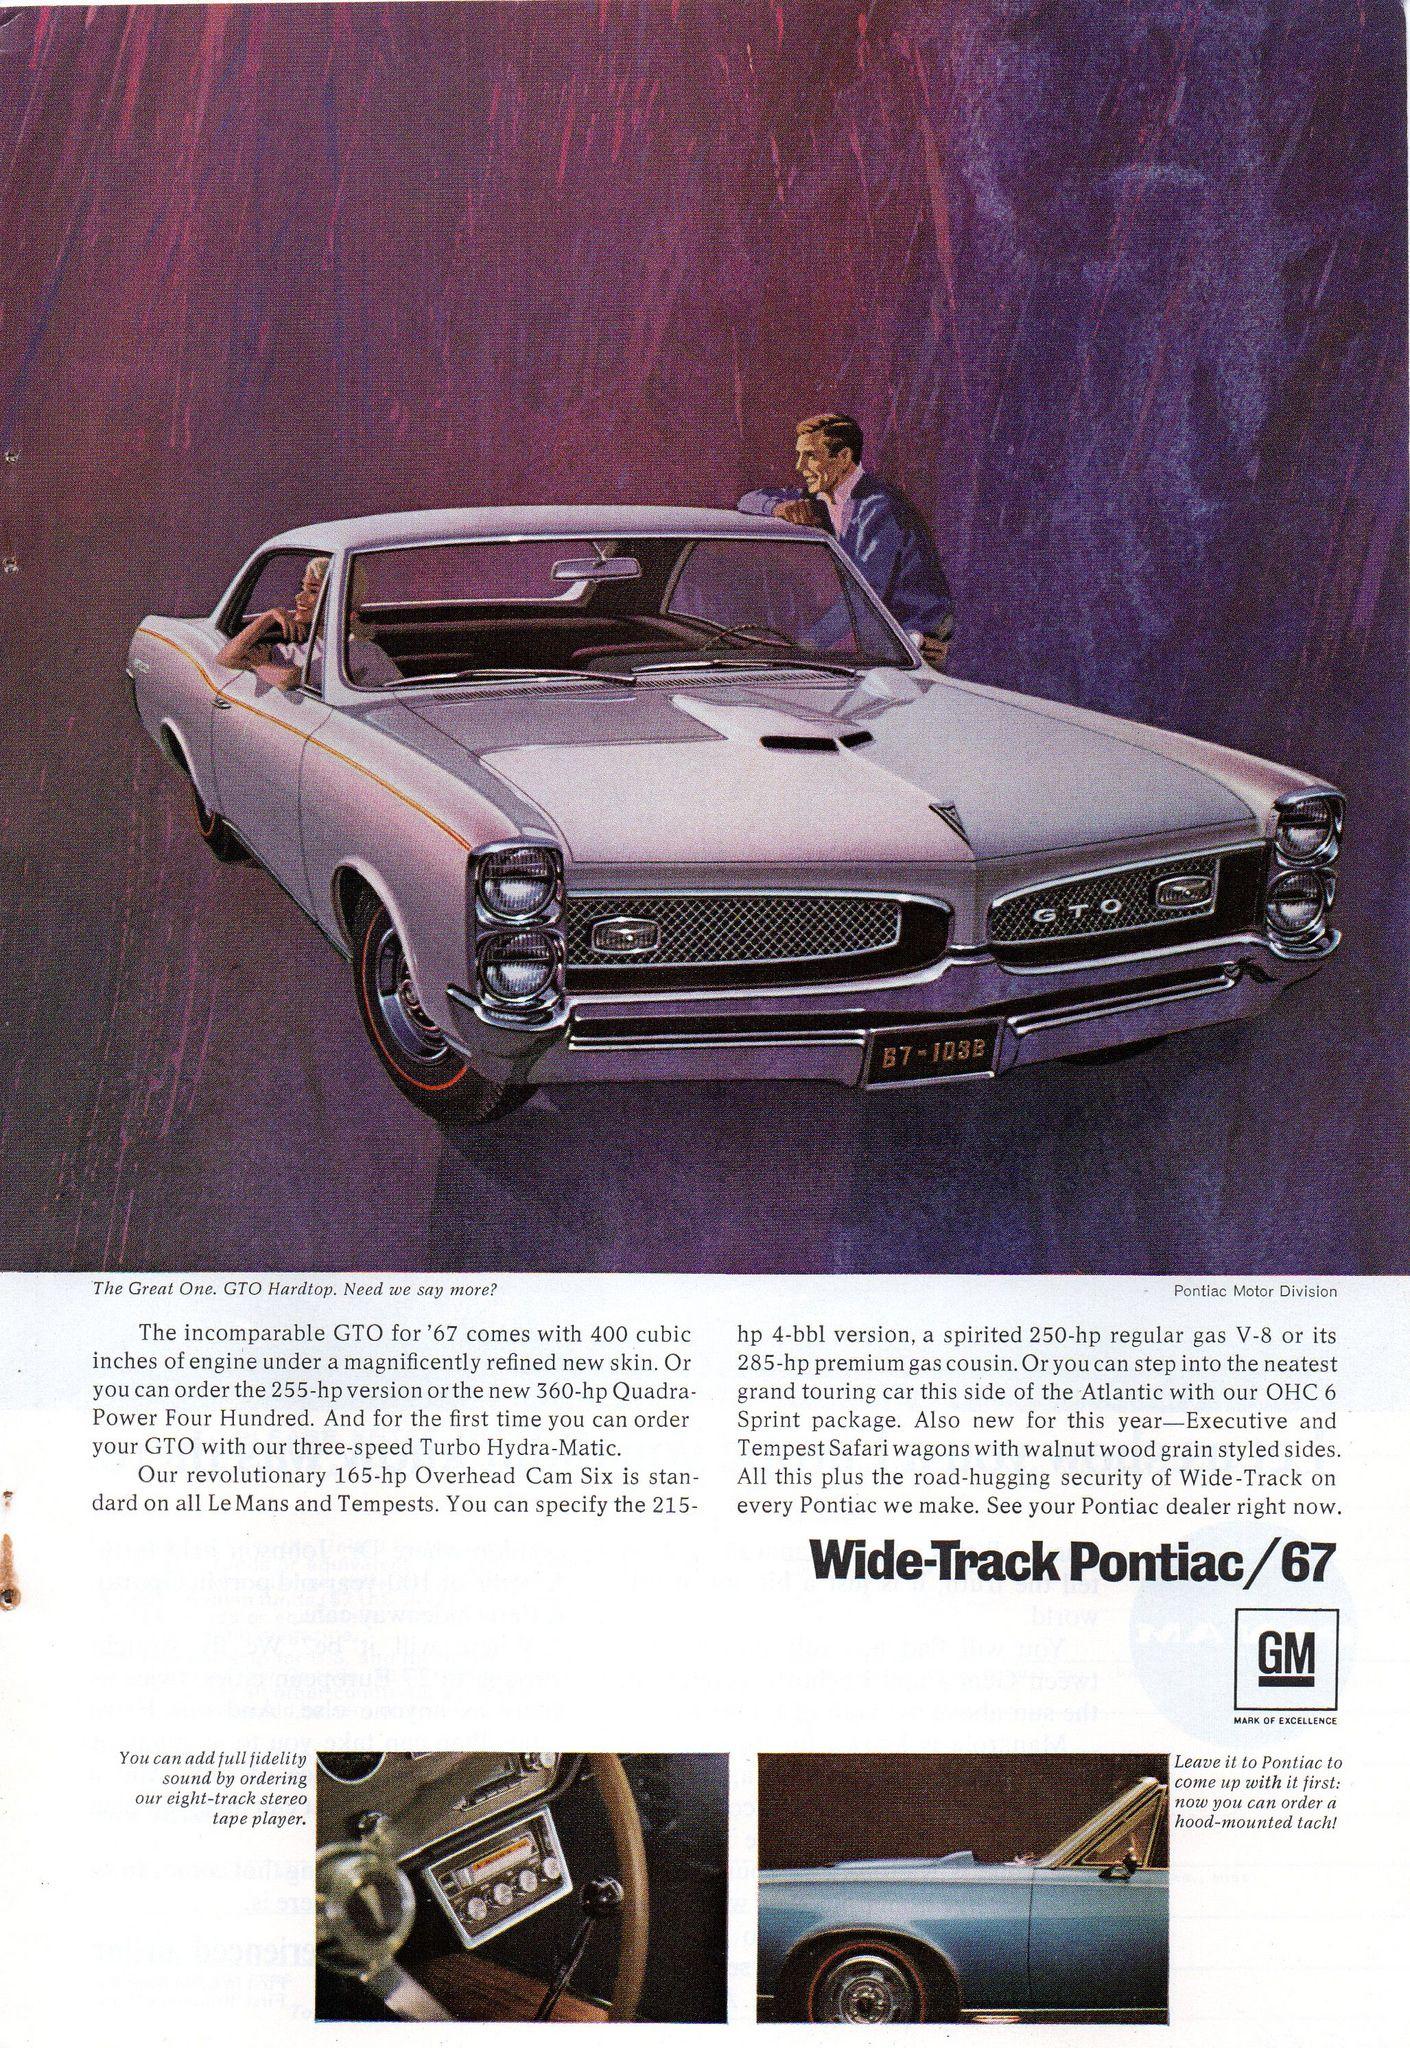 1967 Pontiac Bonneville & GTO Page 2 USA Original Magazine